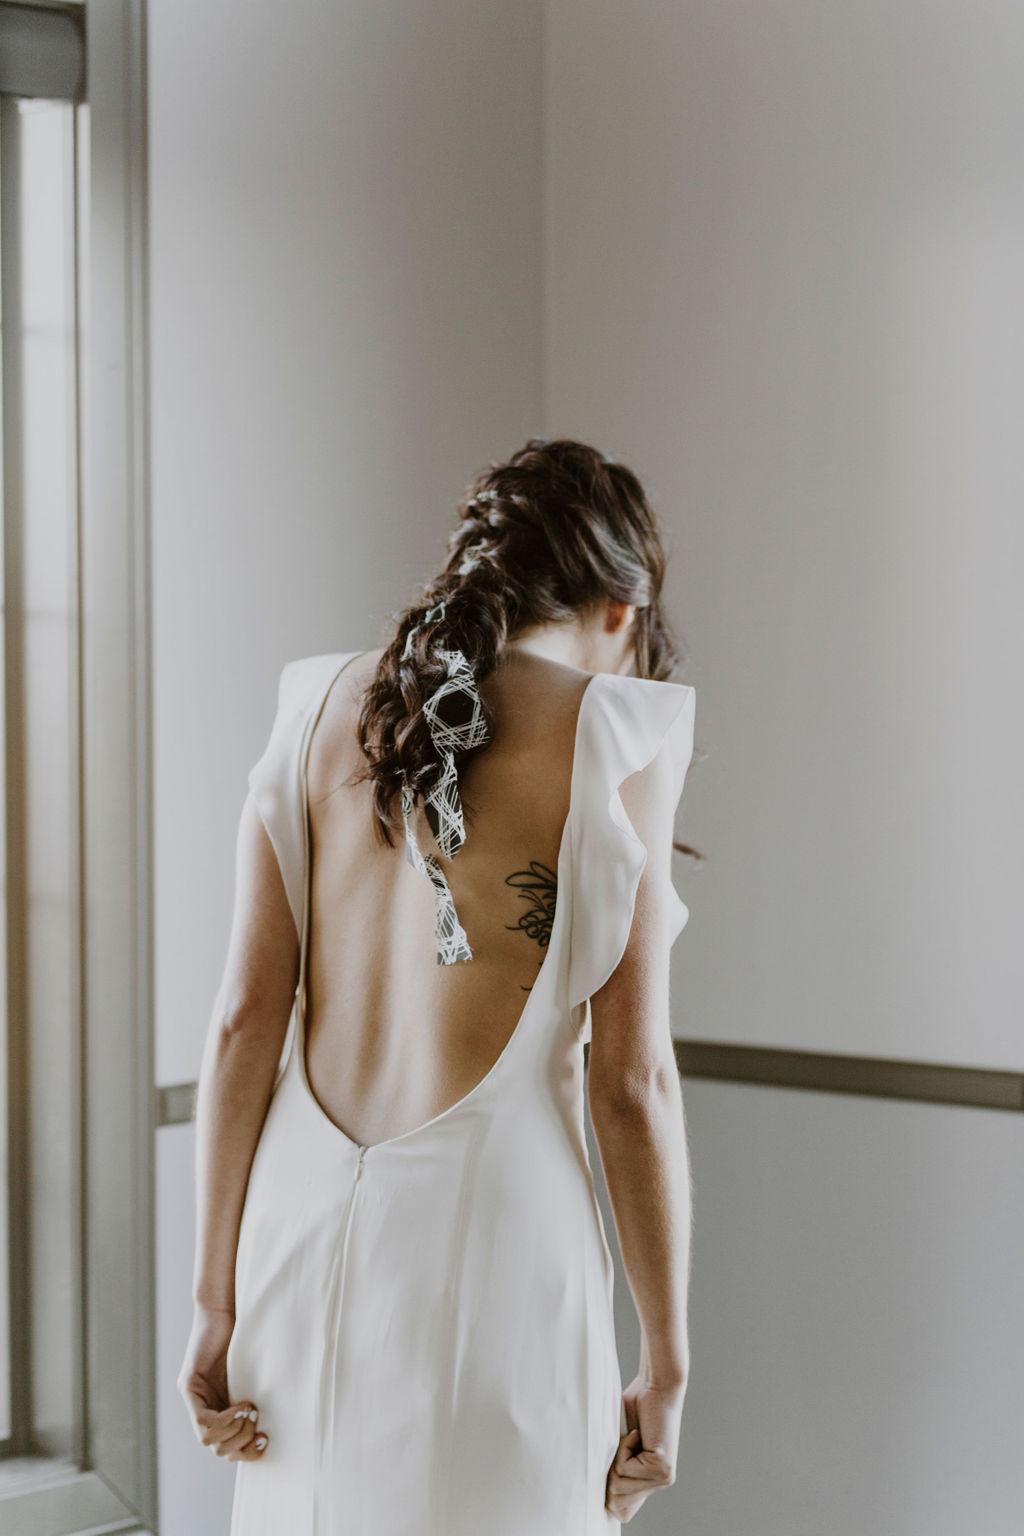 La Mariée Moderne - Styled Bridal Shoot at Crestmont Hall in Calgary, Alberta - on the Bronte Bride Blog